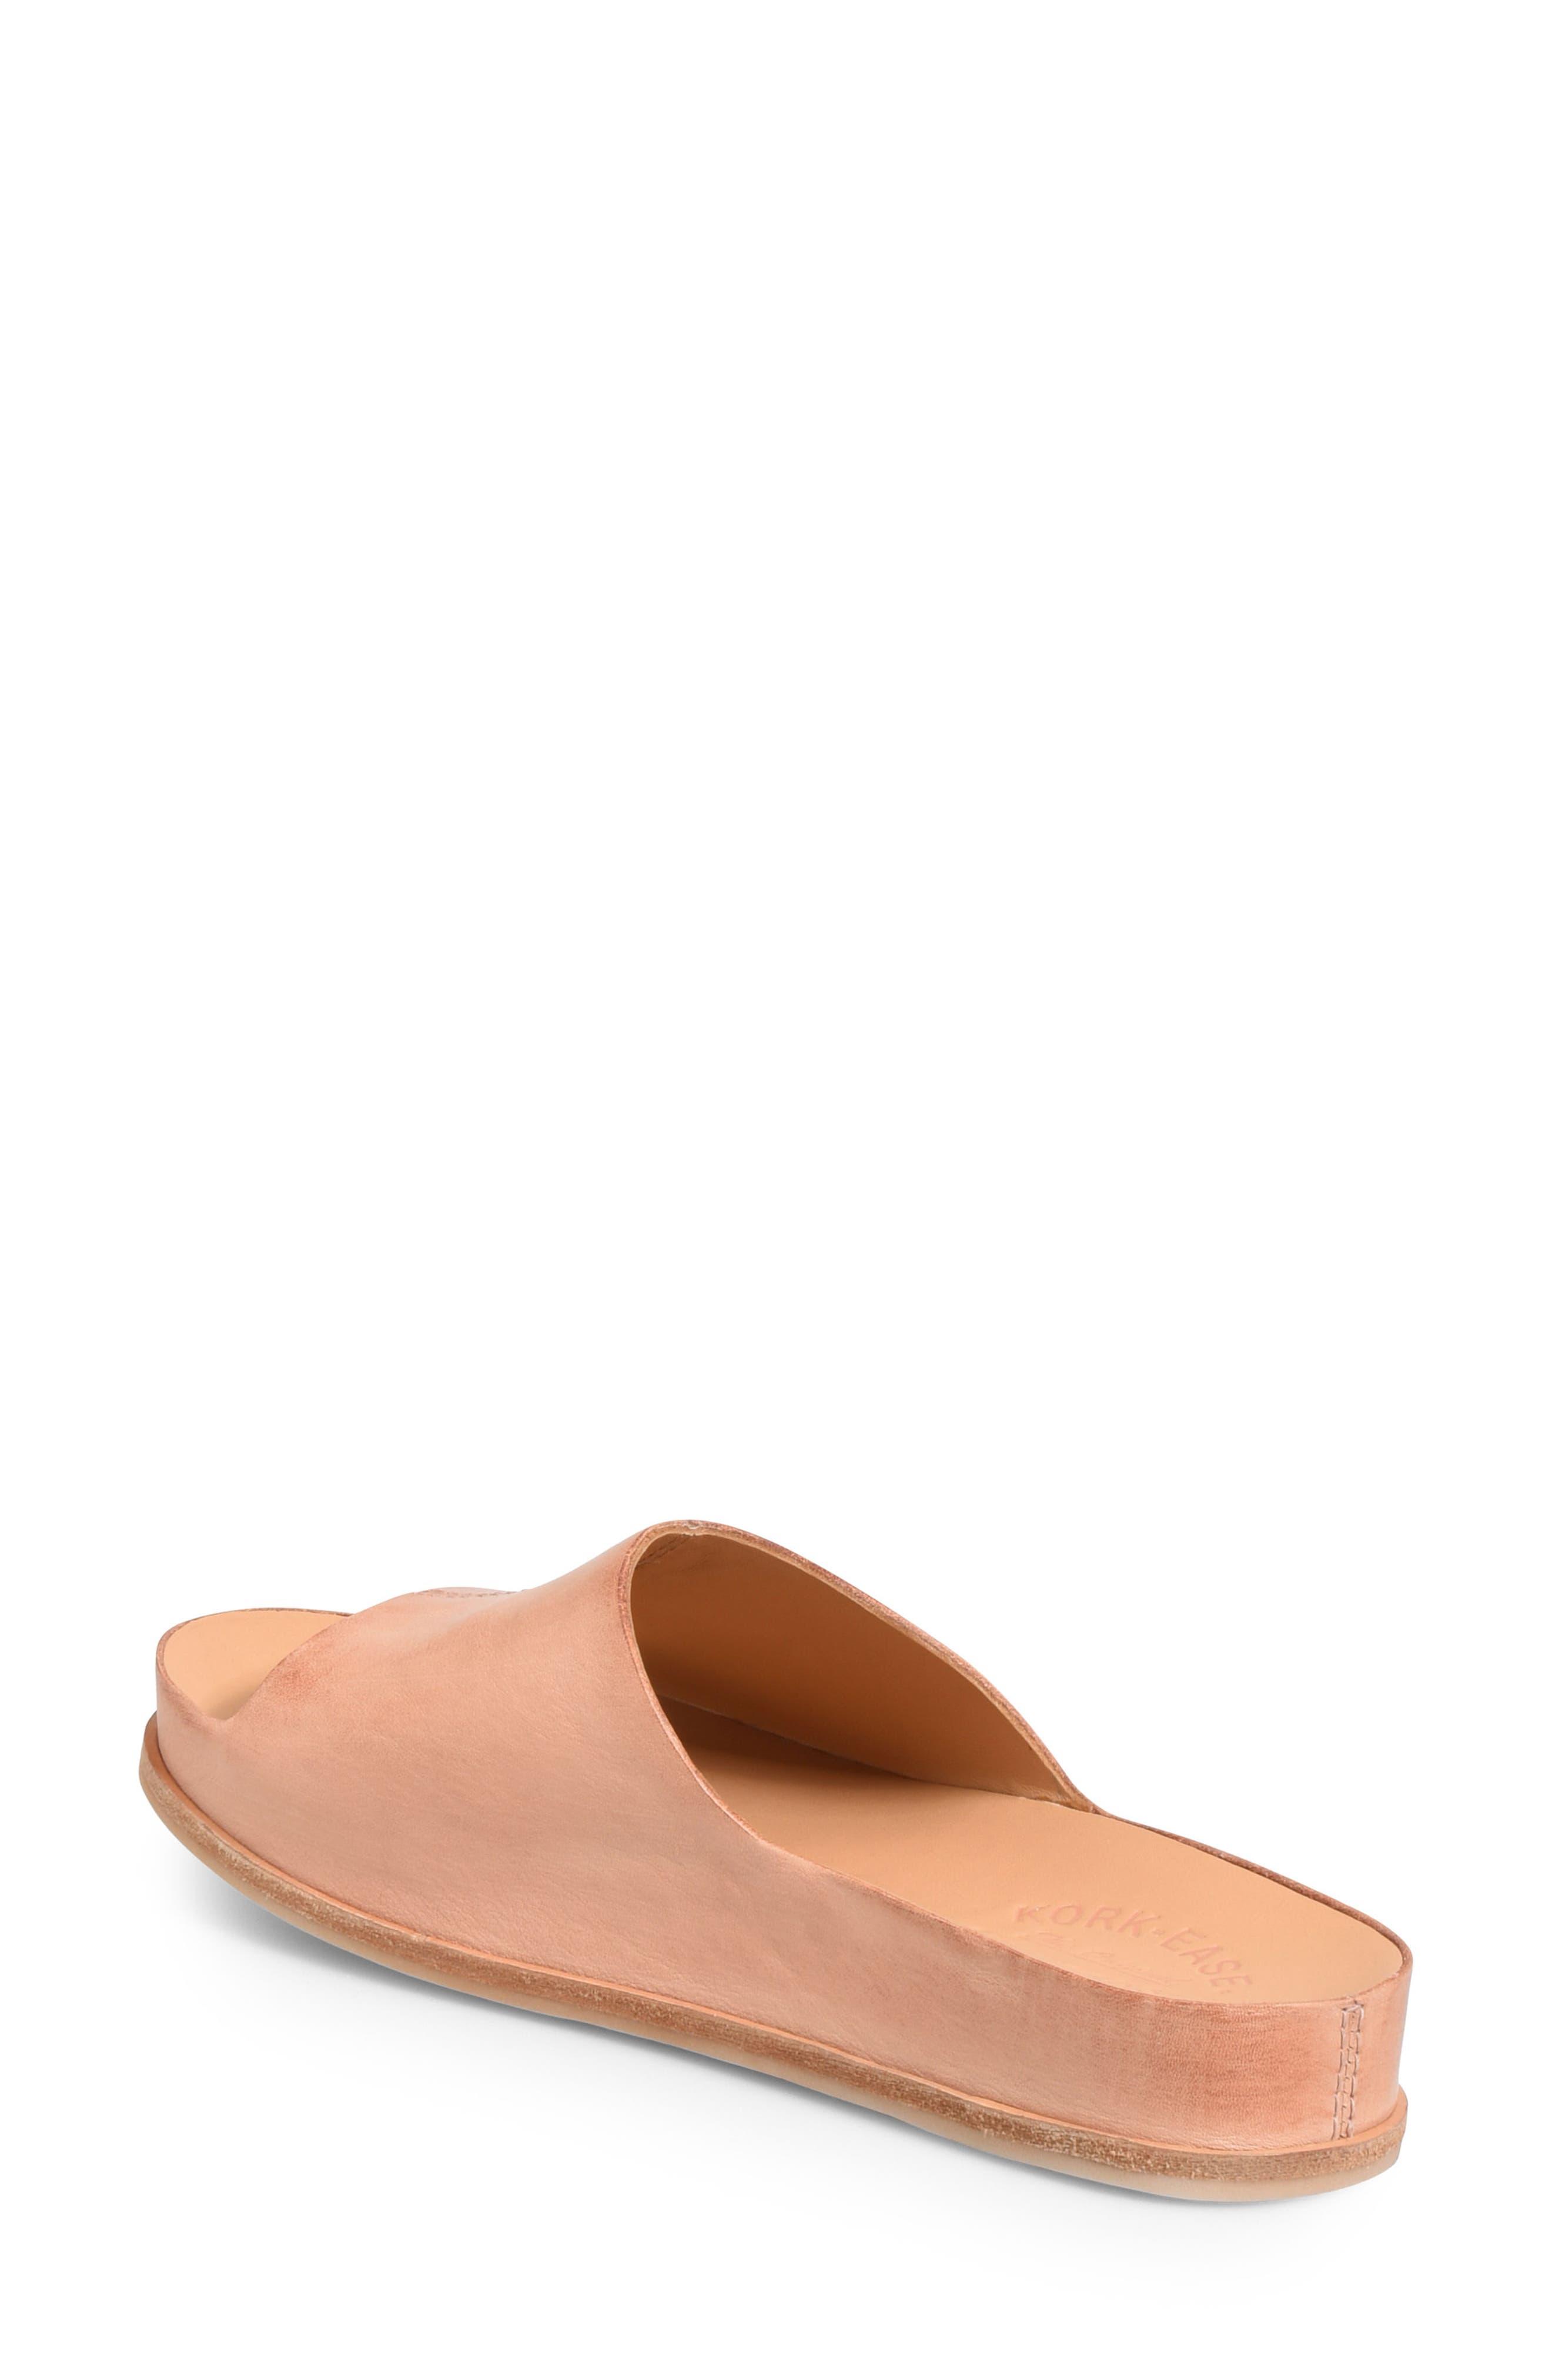 'Tutsi' Slide Sandal,                             Alternate thumbnail 2, color,                             Blush Leather